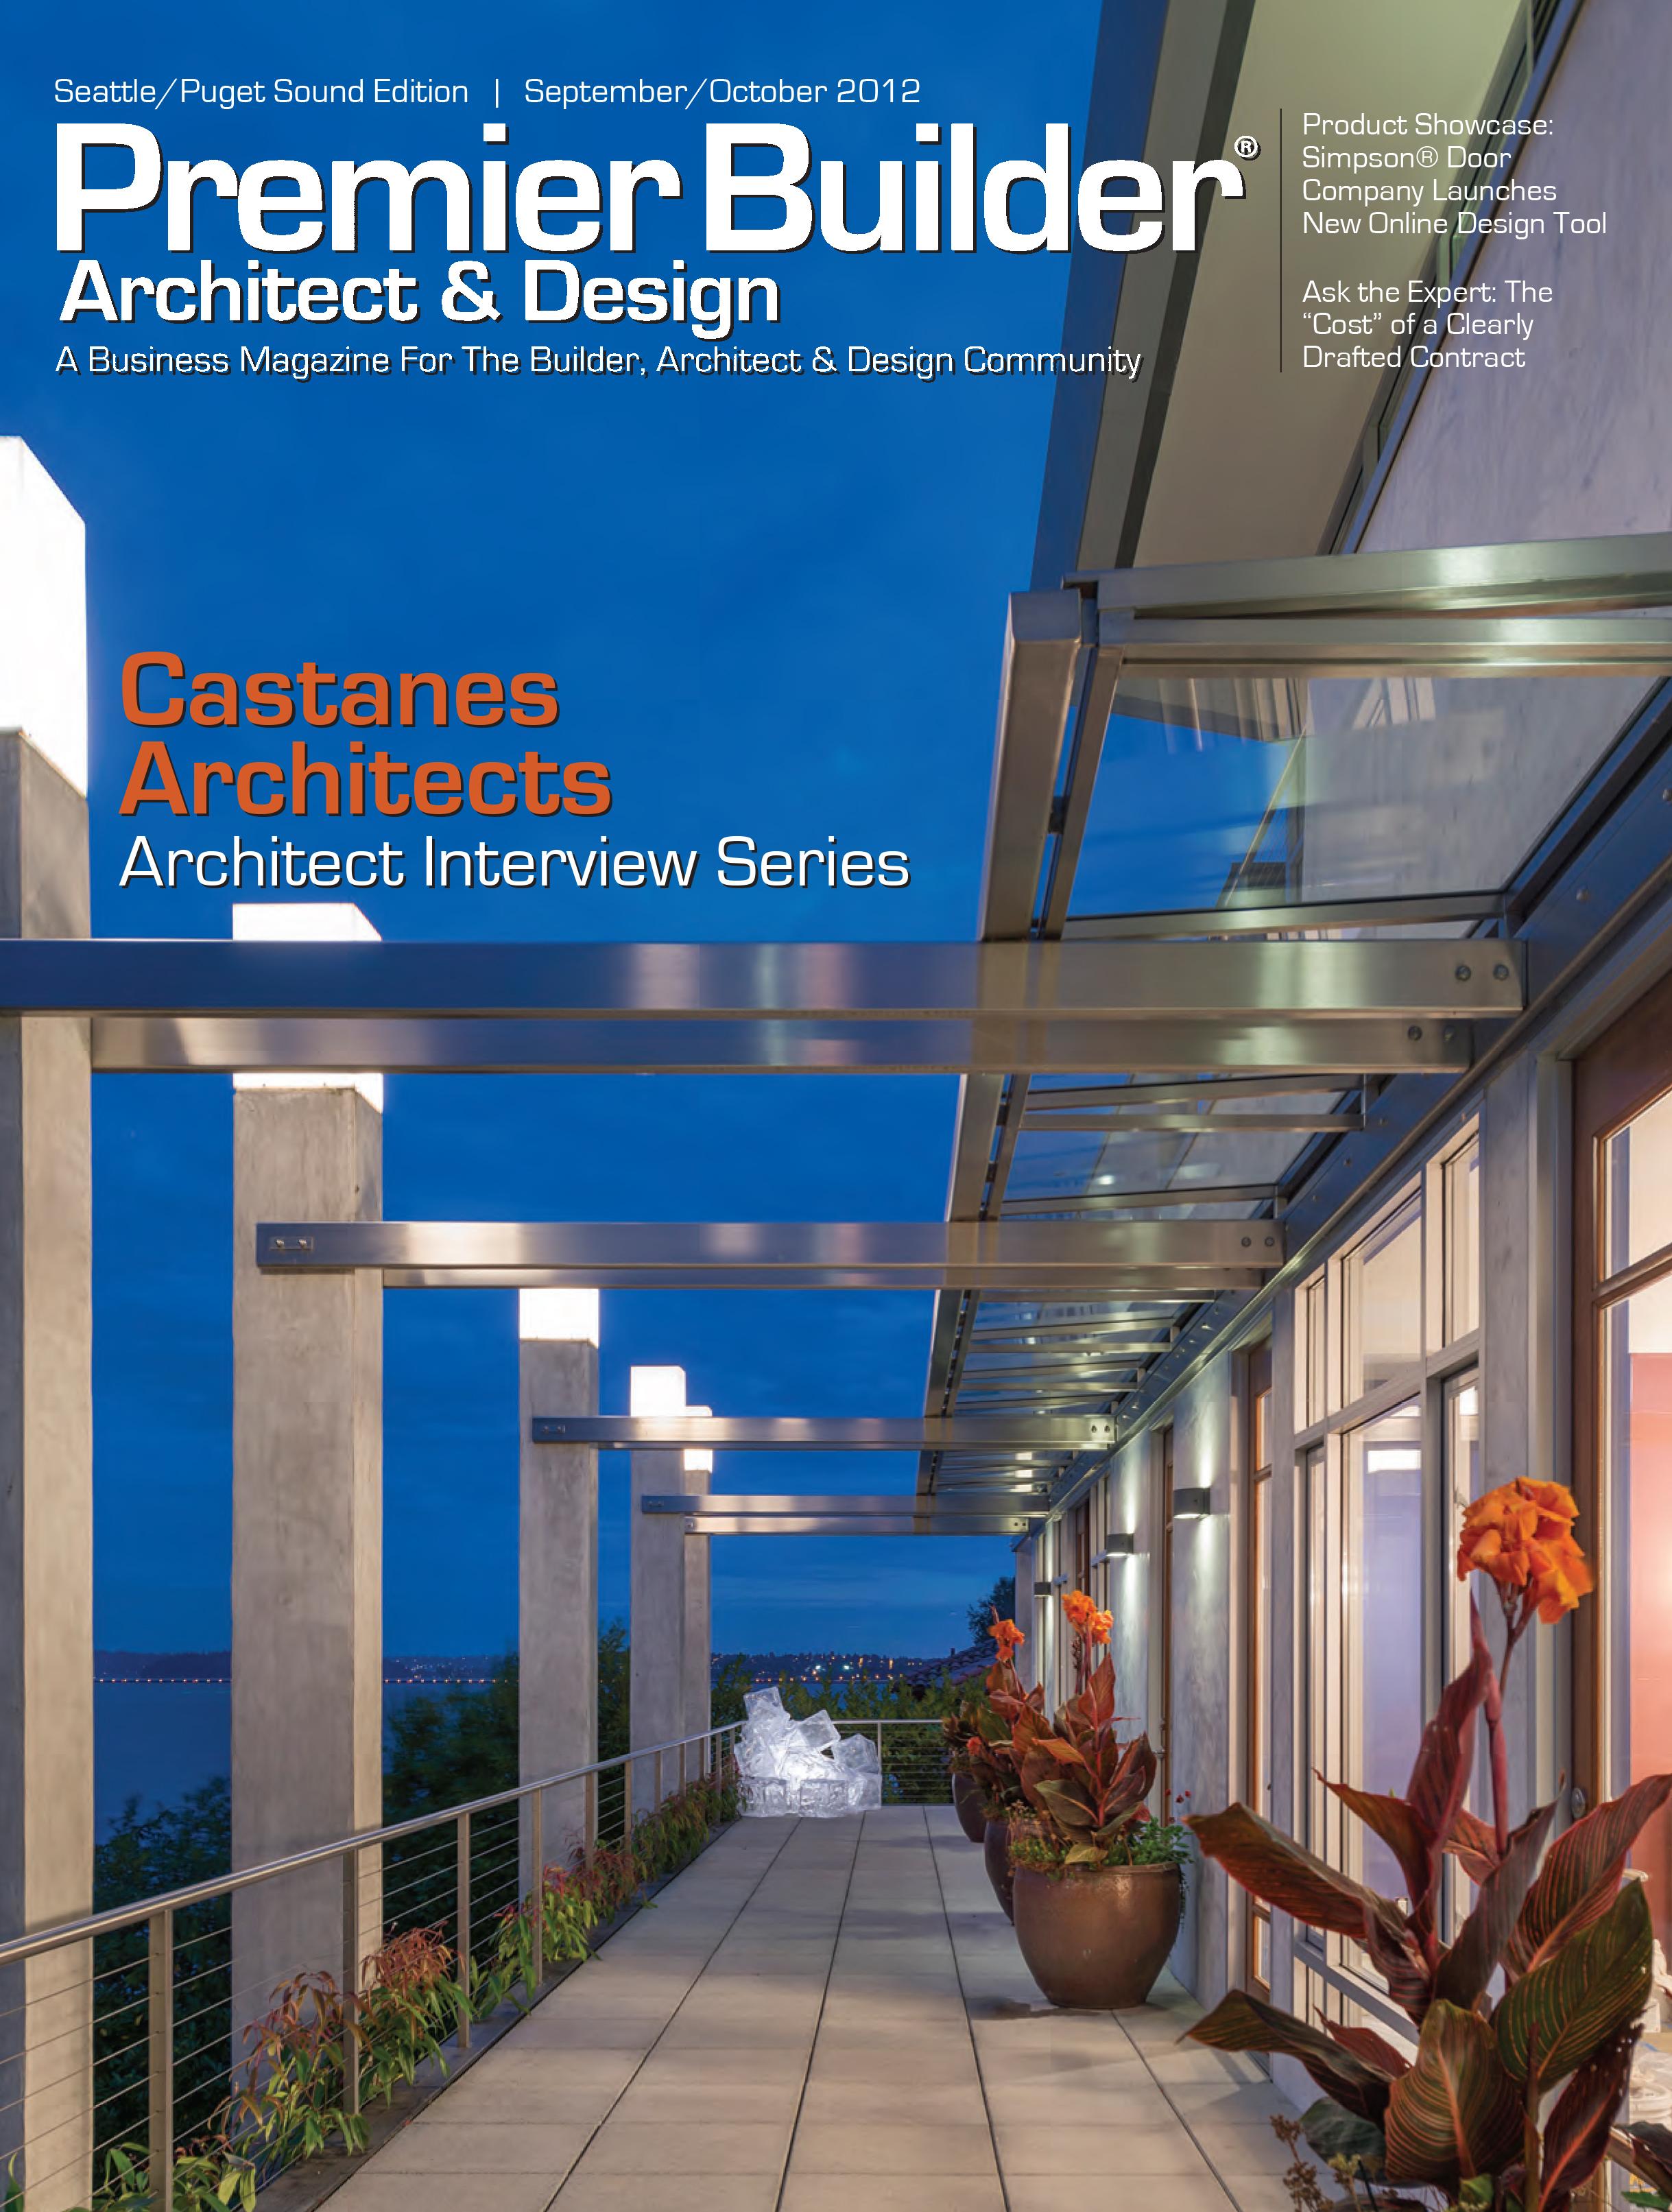 Premier-Builder-Castanes-0910-12 cover